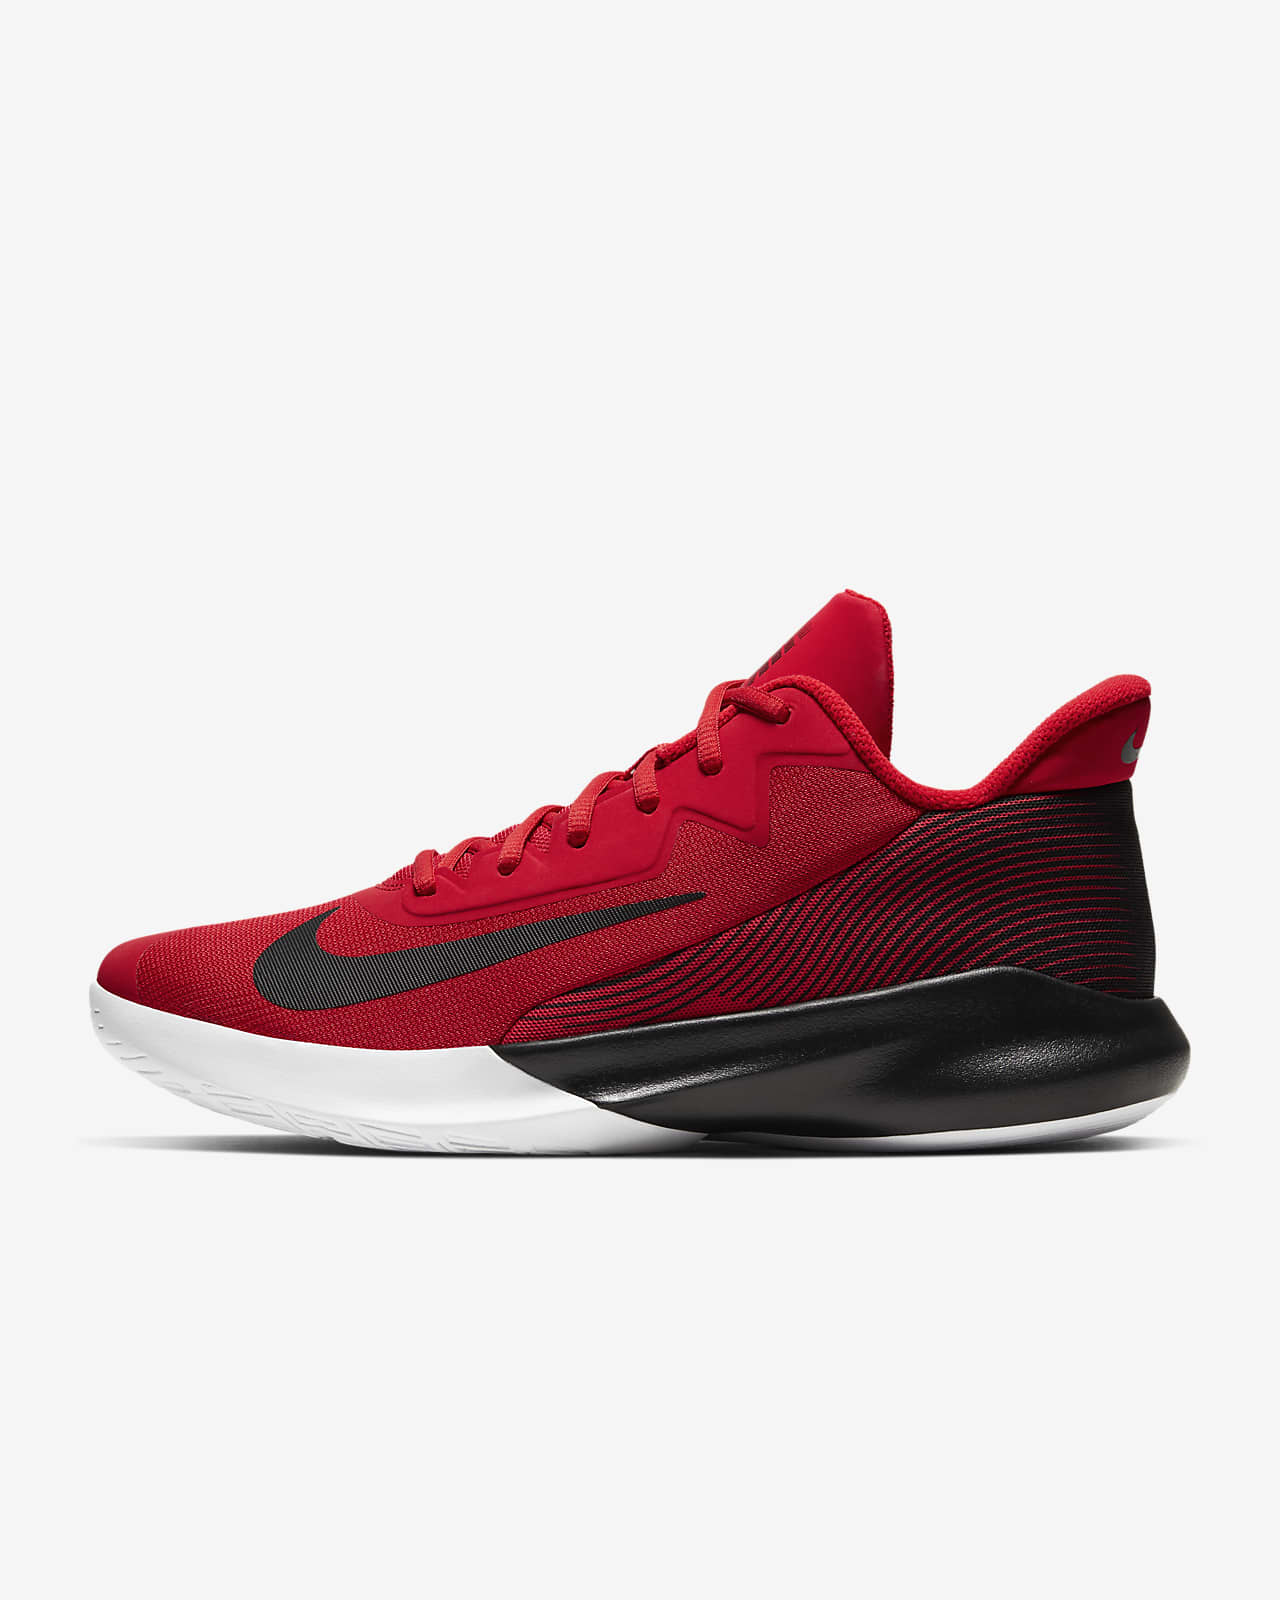 Calzado de básquetbol Nike Precision 4